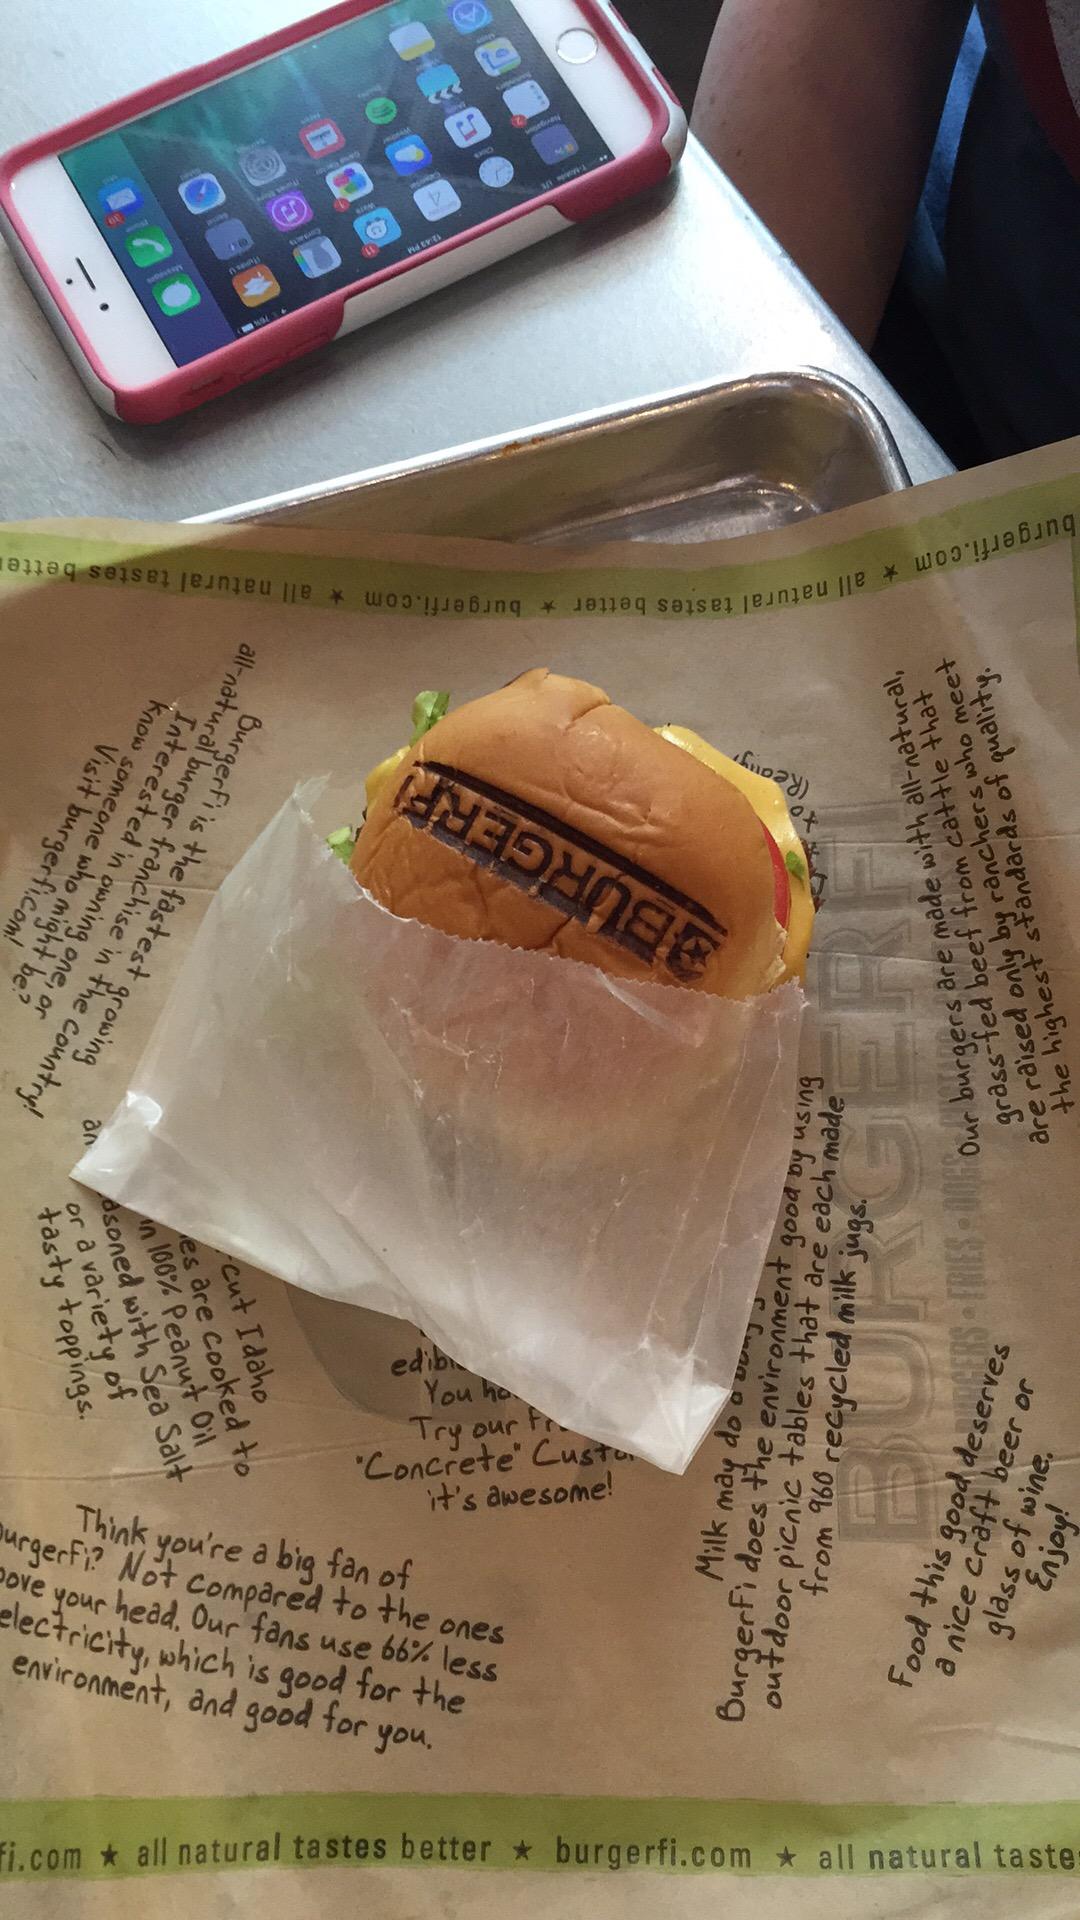 We appreciated the branded bun at BurgerFi.